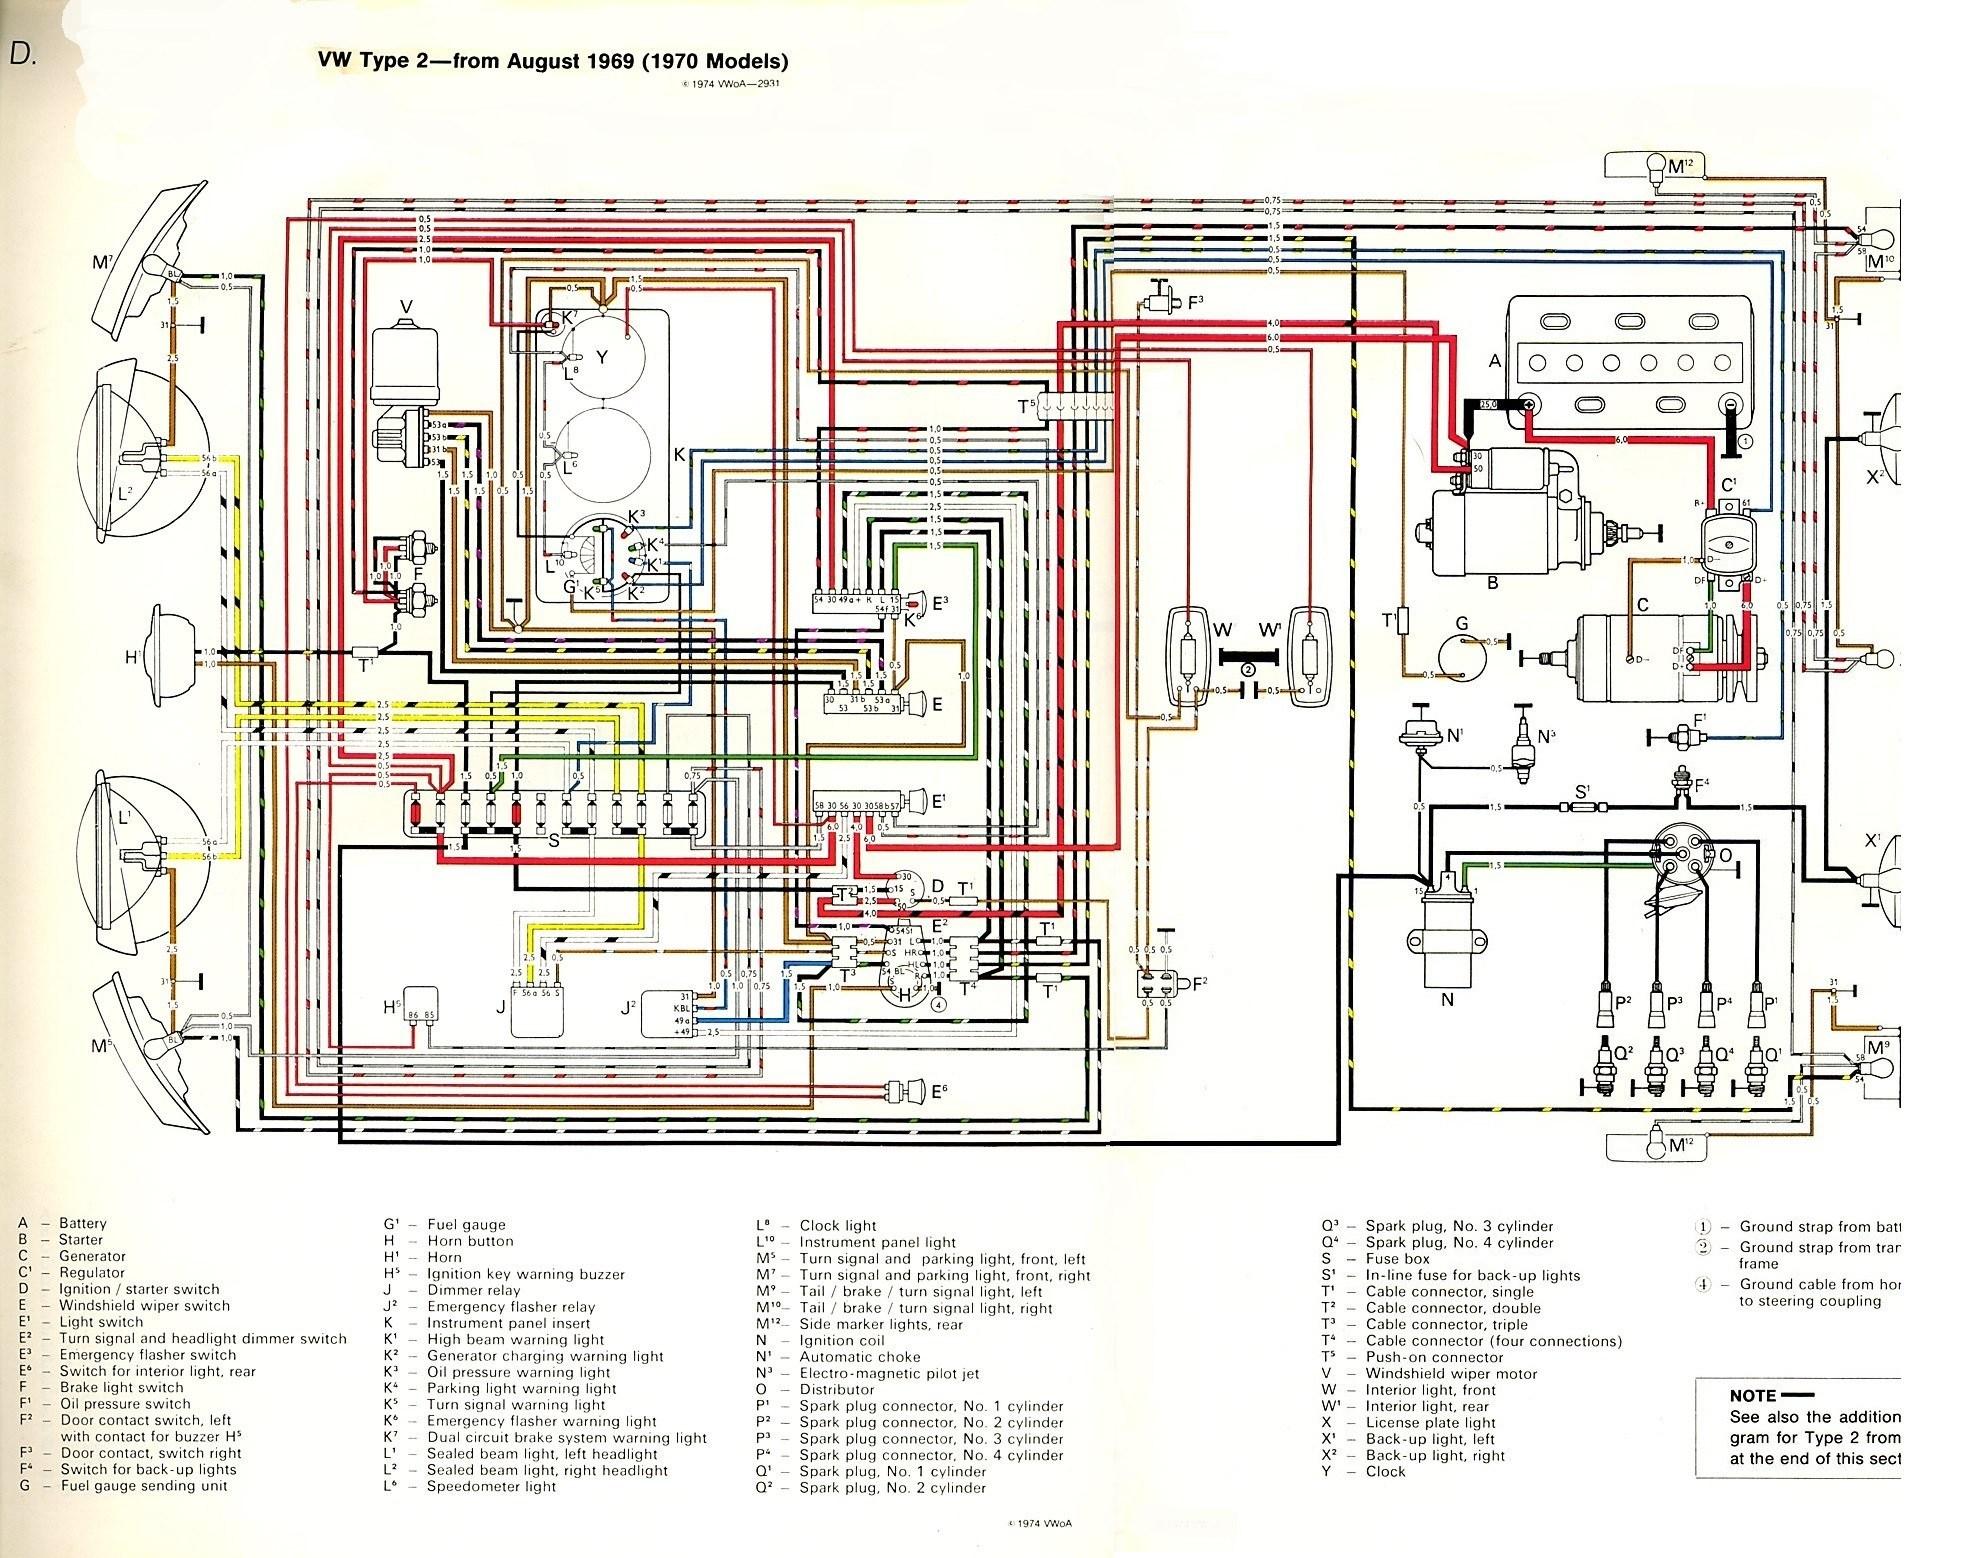 75 Vw Beetle Fuel Gauge Wiring Diagram - Center Wiring Diagram  inside-canvas - inside-canvas.iosonointersex.it   75 Vw Beetle Fuel Gauge Wiring Diagram      iosonointersex.it